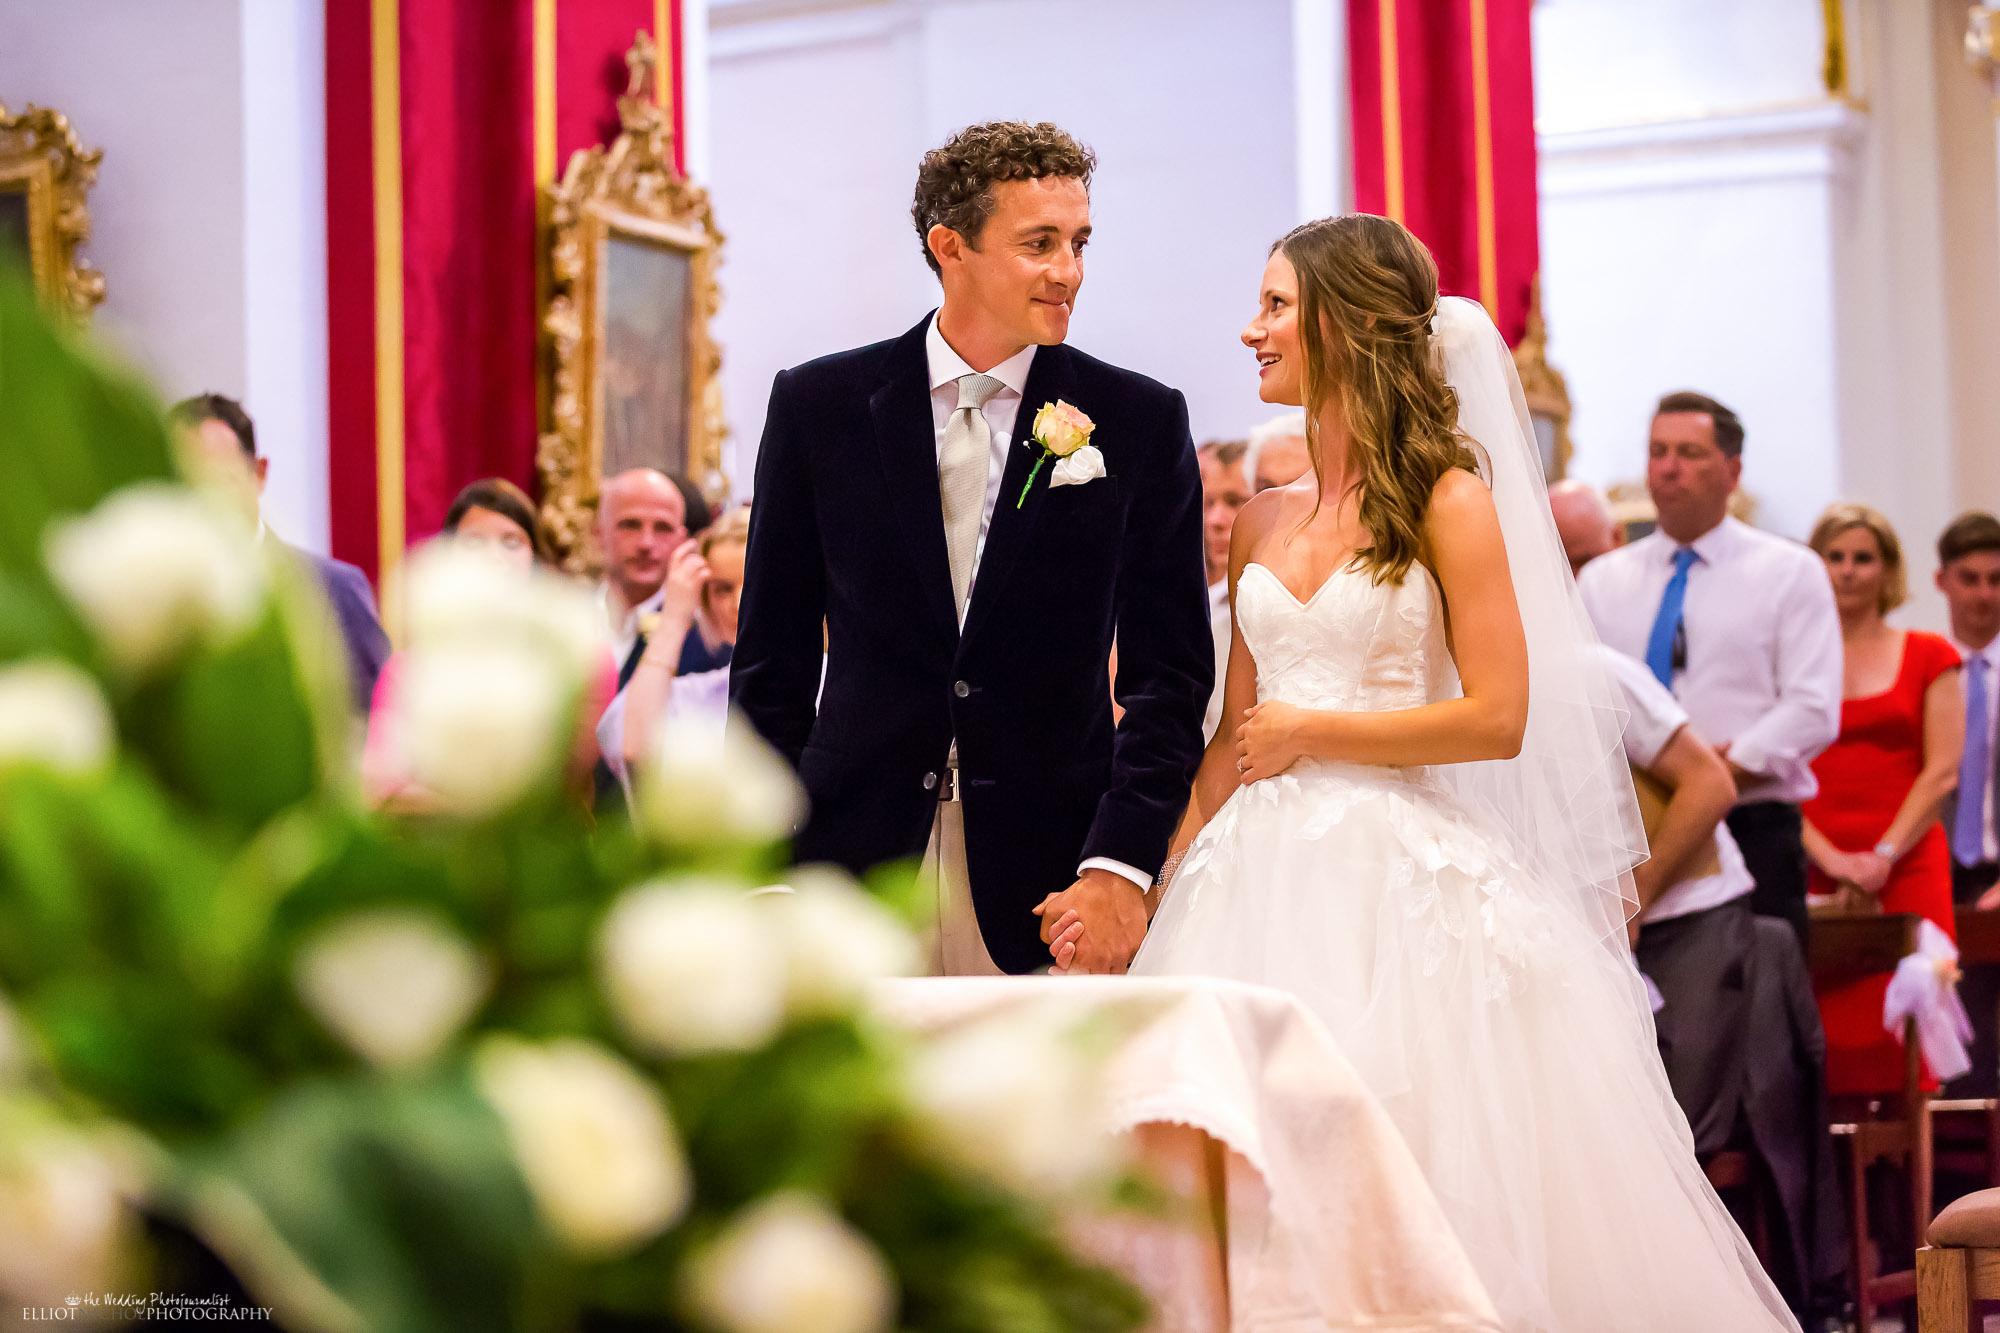 Bride-groom-church-wedding-ceremony-Northeast-photographer